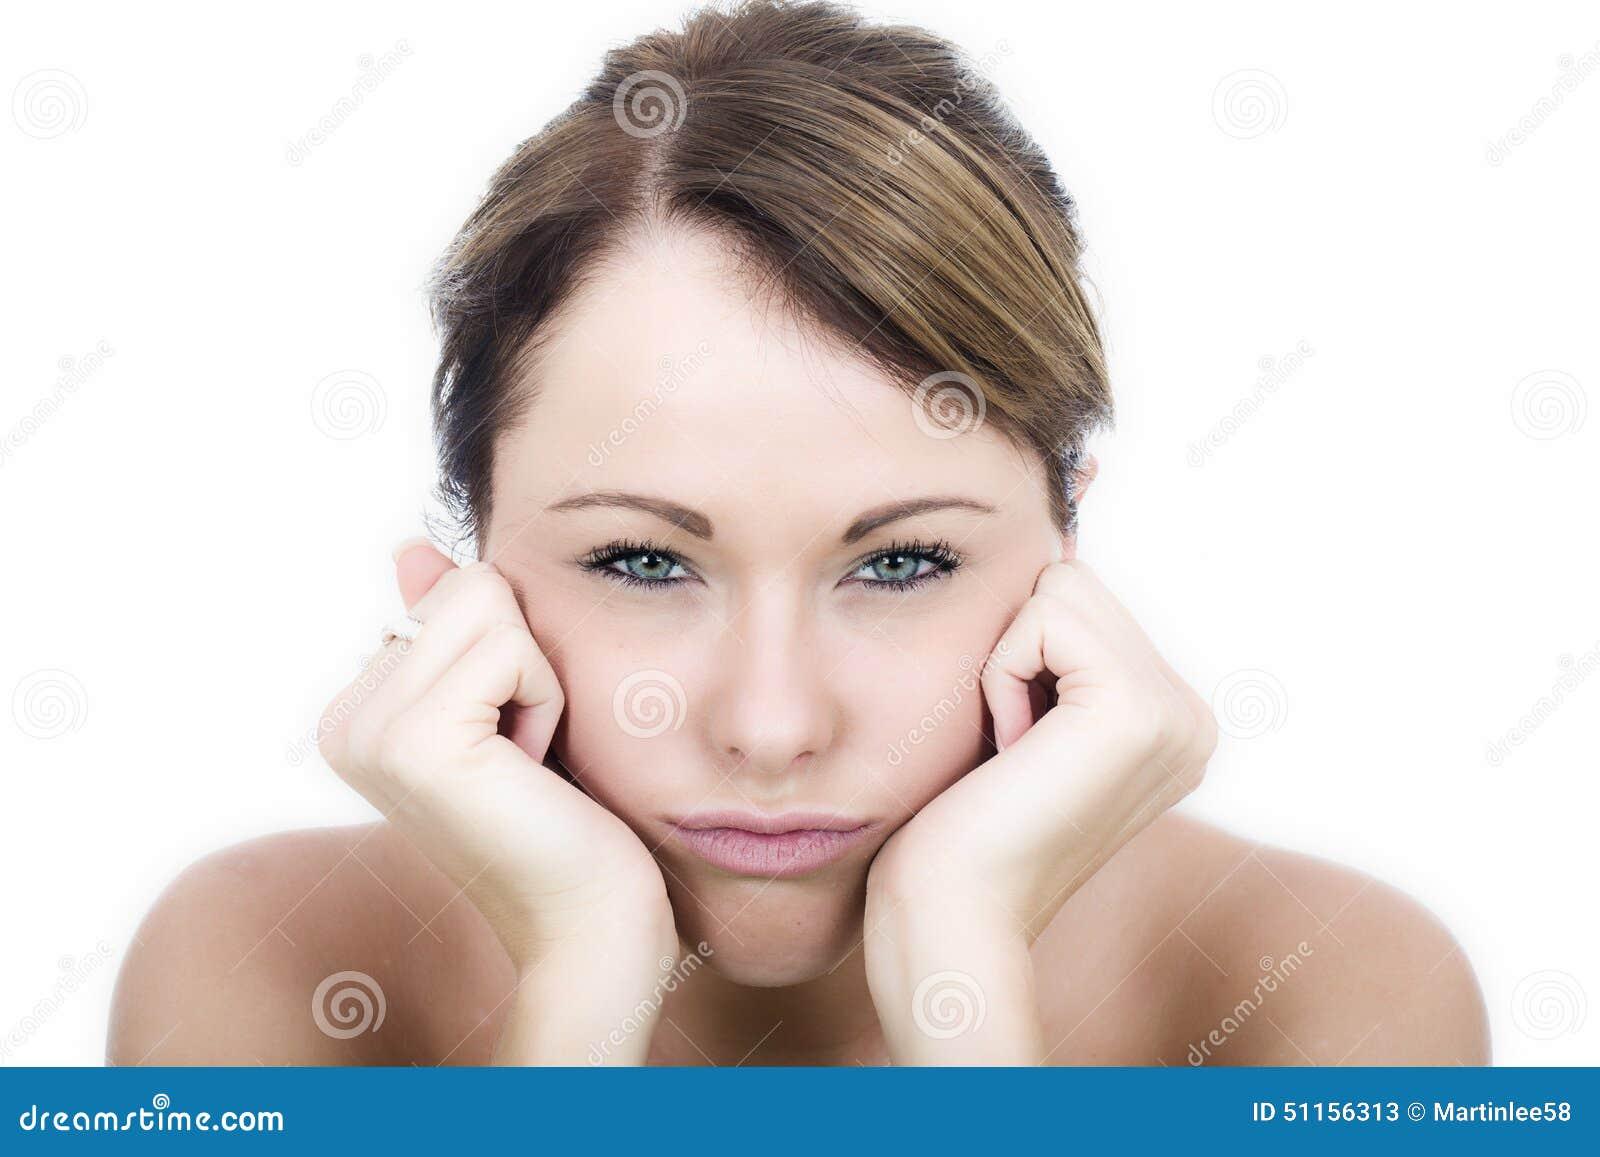 Junge Frau Fed Up Bored Frustrated Grumpys